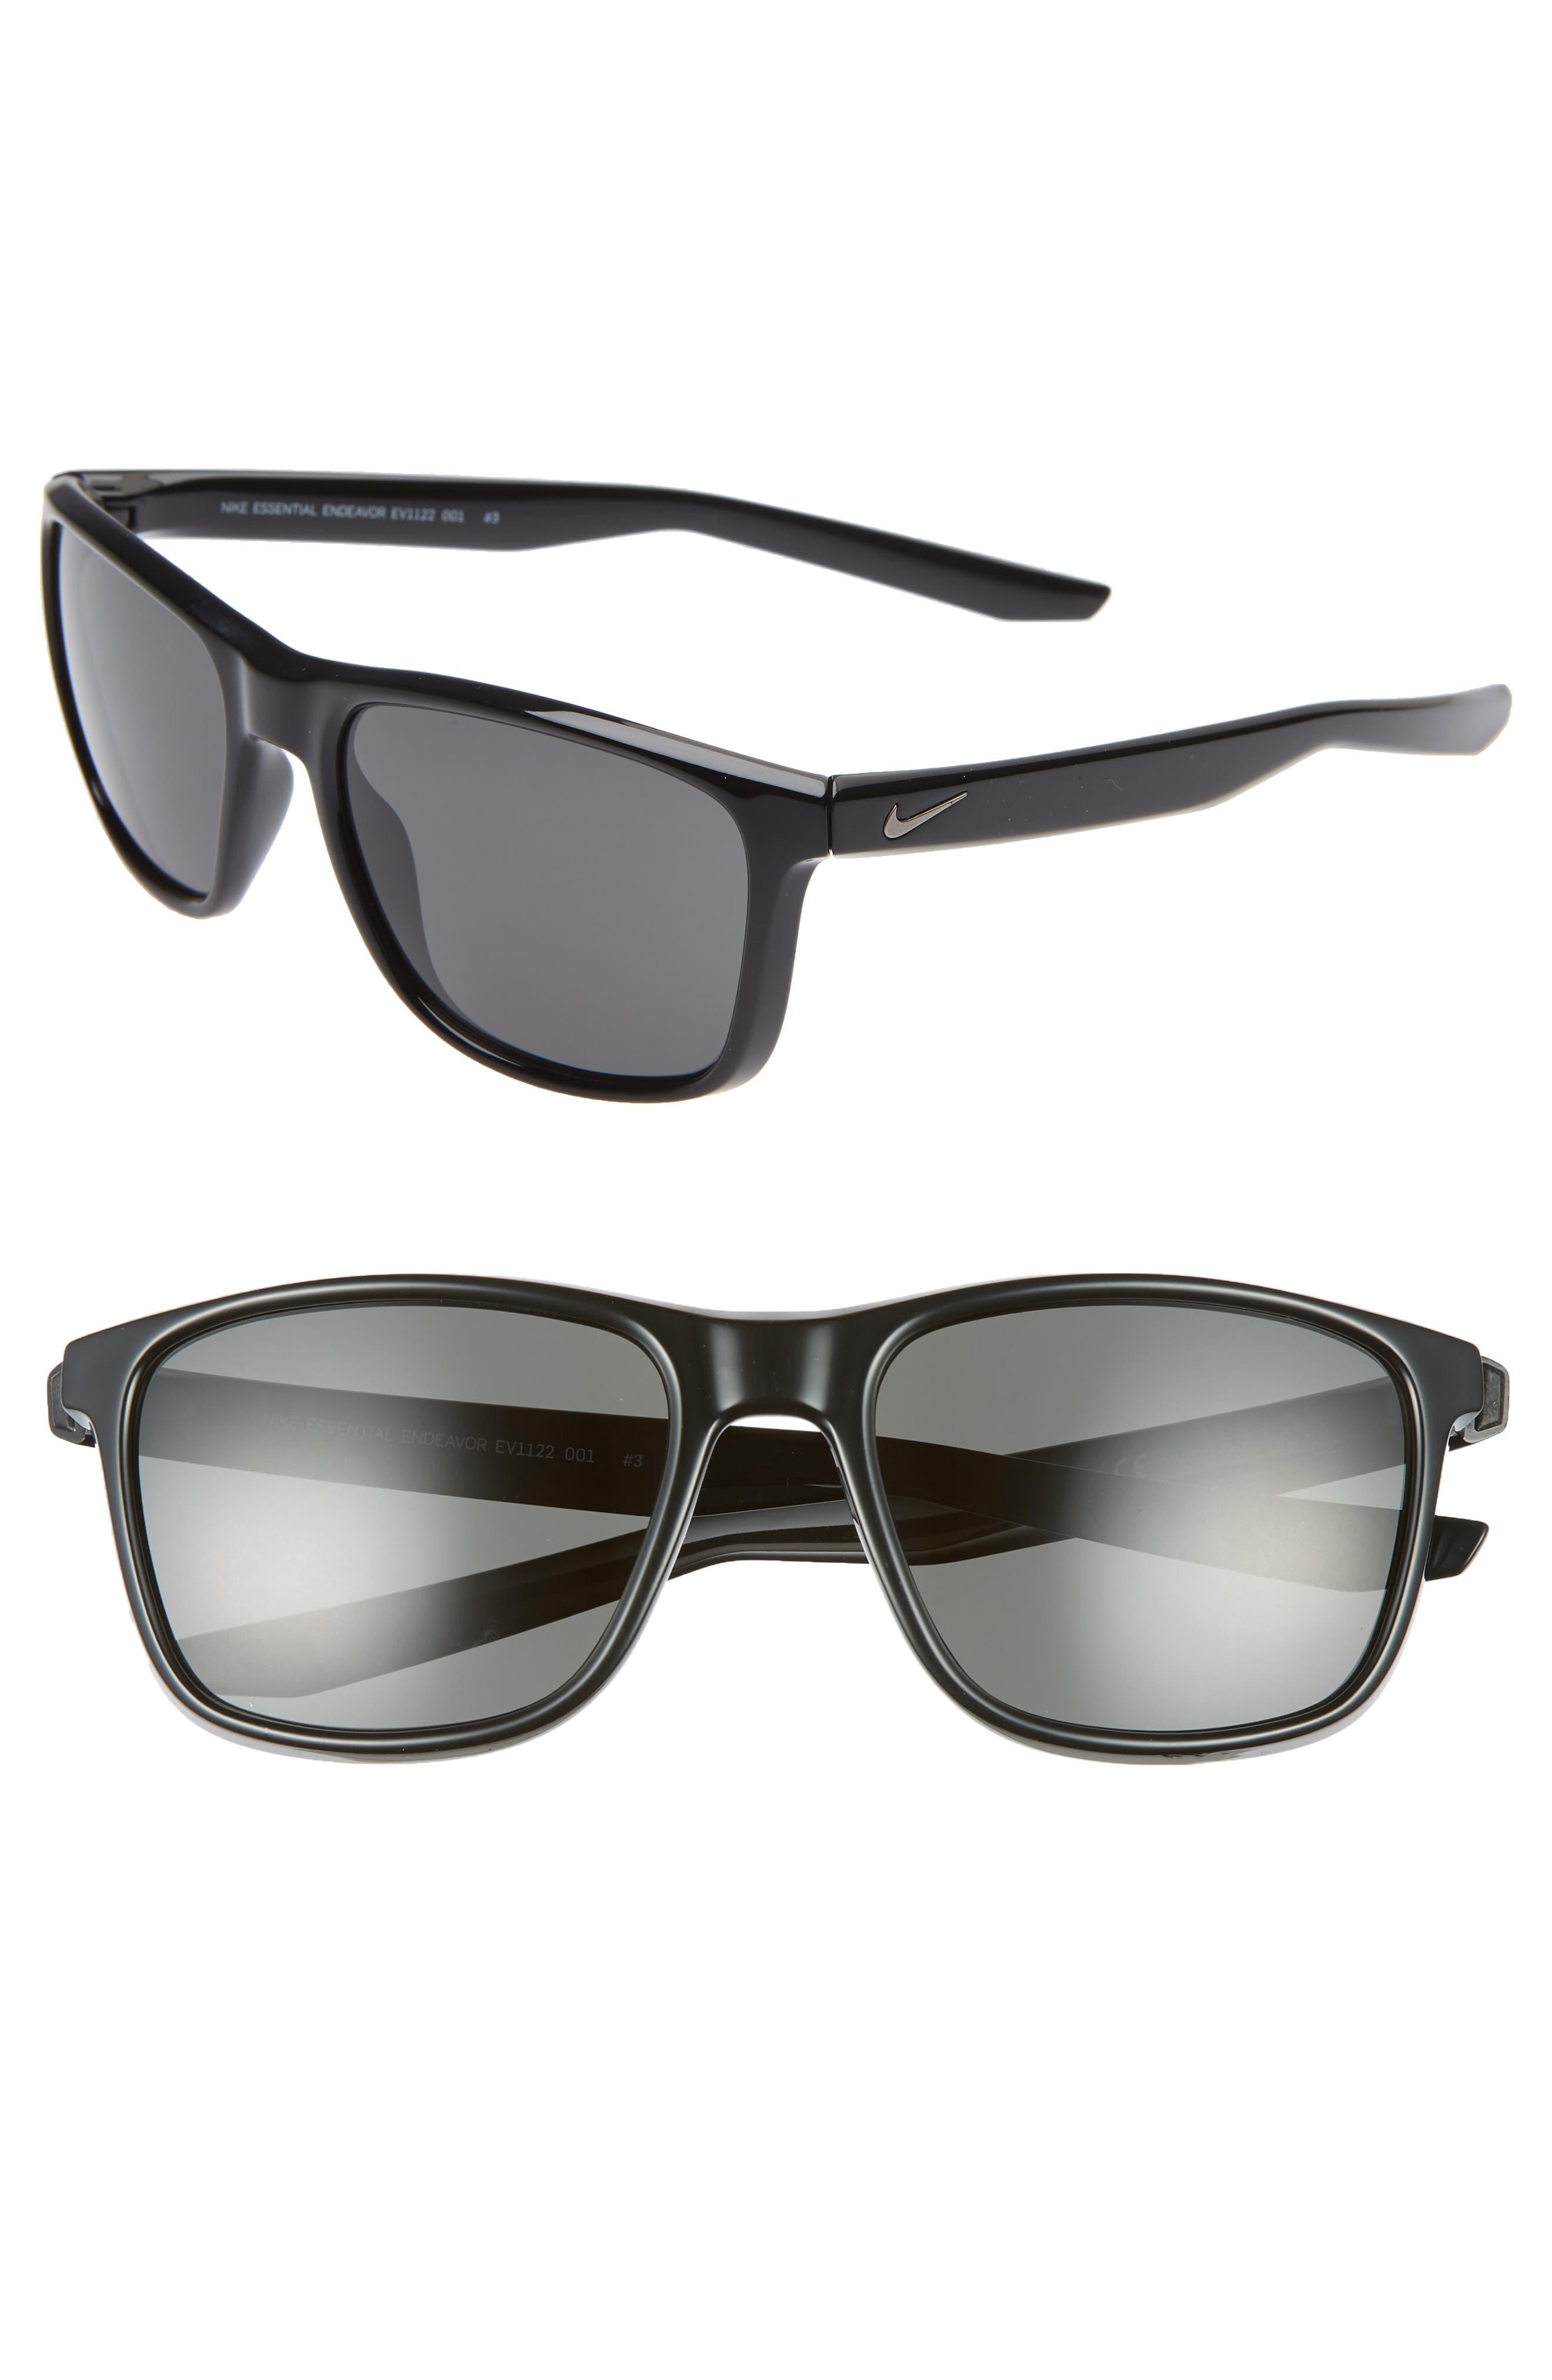 Essential Endeavor 57mm Square Sunglasses, Main, color, BLACK/ GREY